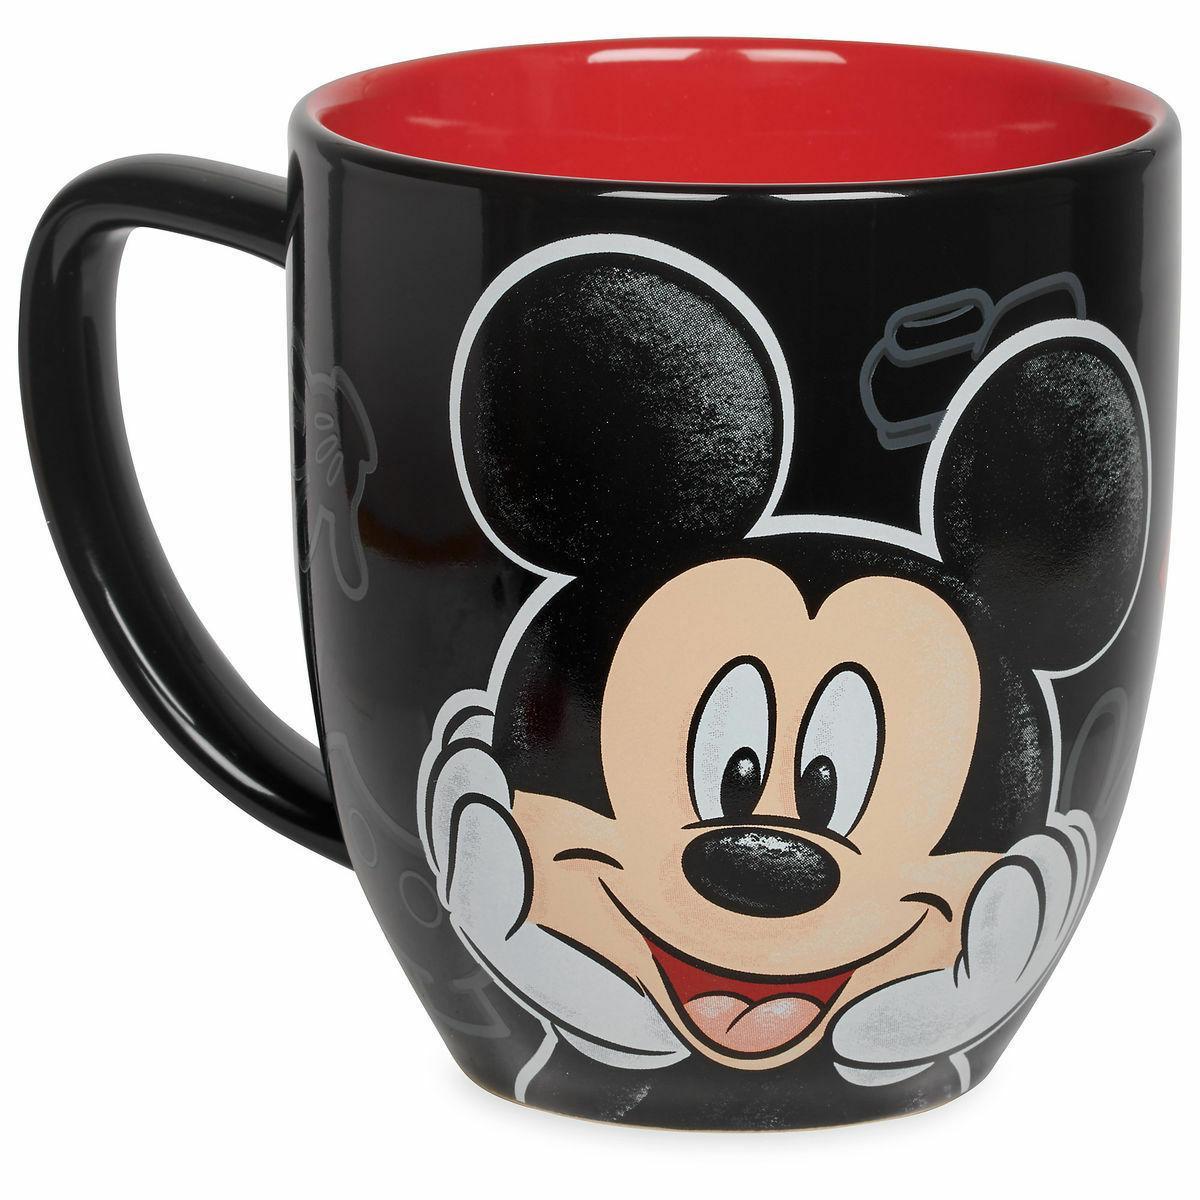 Disney Mickey Mouse Portrait Ceramic Coffee Mug 12 oz